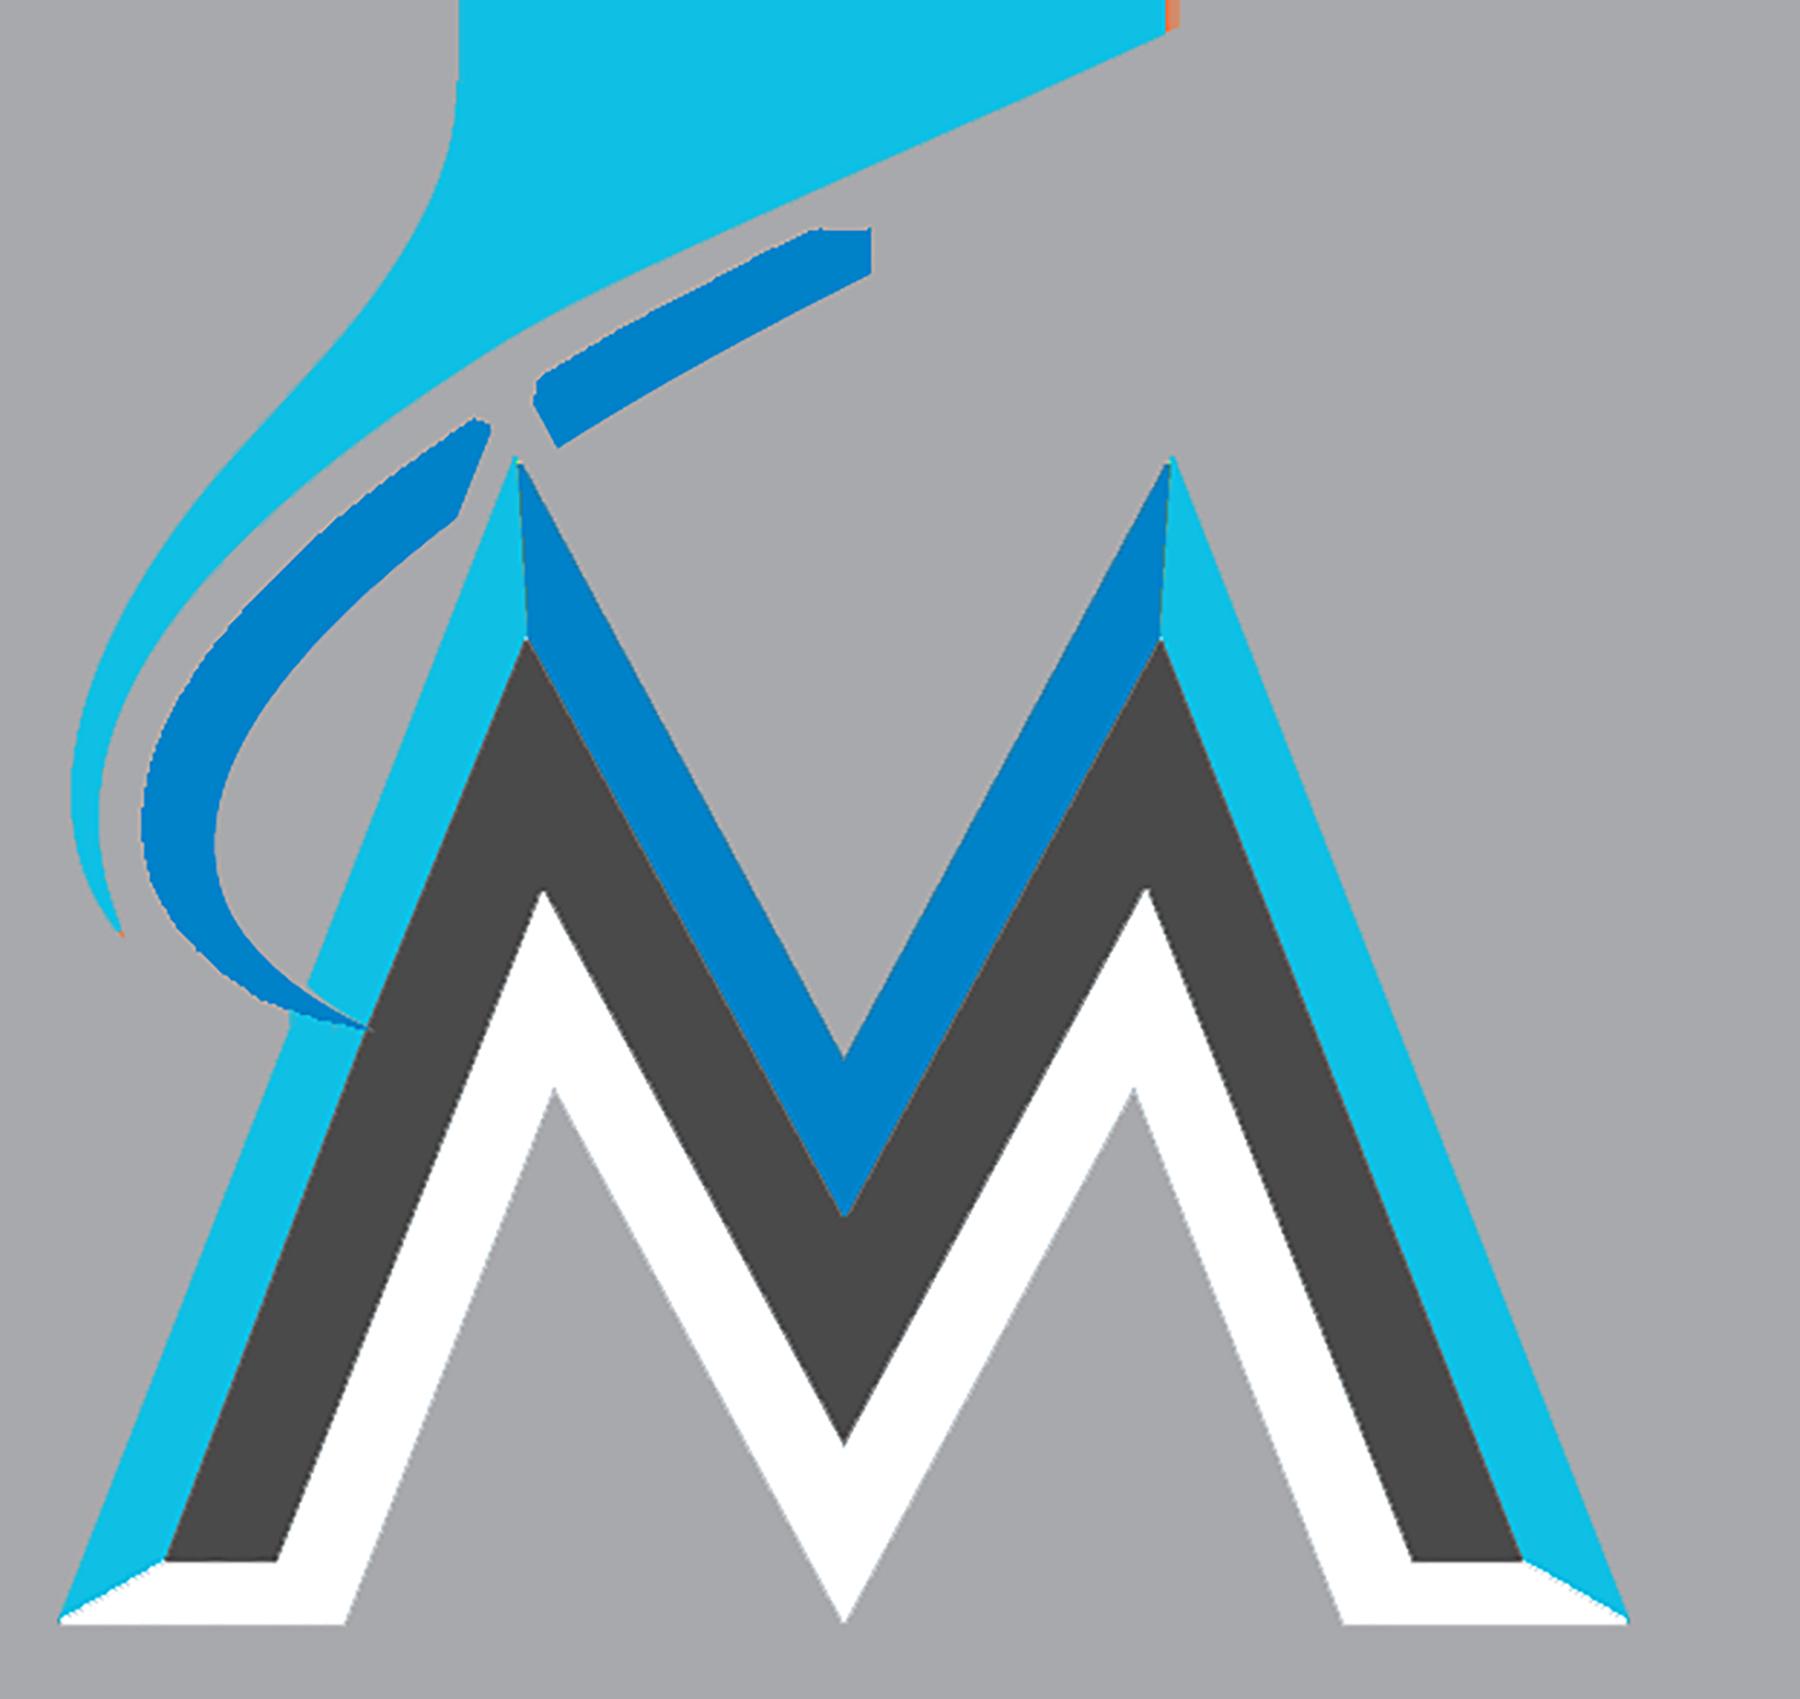 Miami marlins baseball jersey clipart clip art black and white library Marlins Logos clip art black and white library